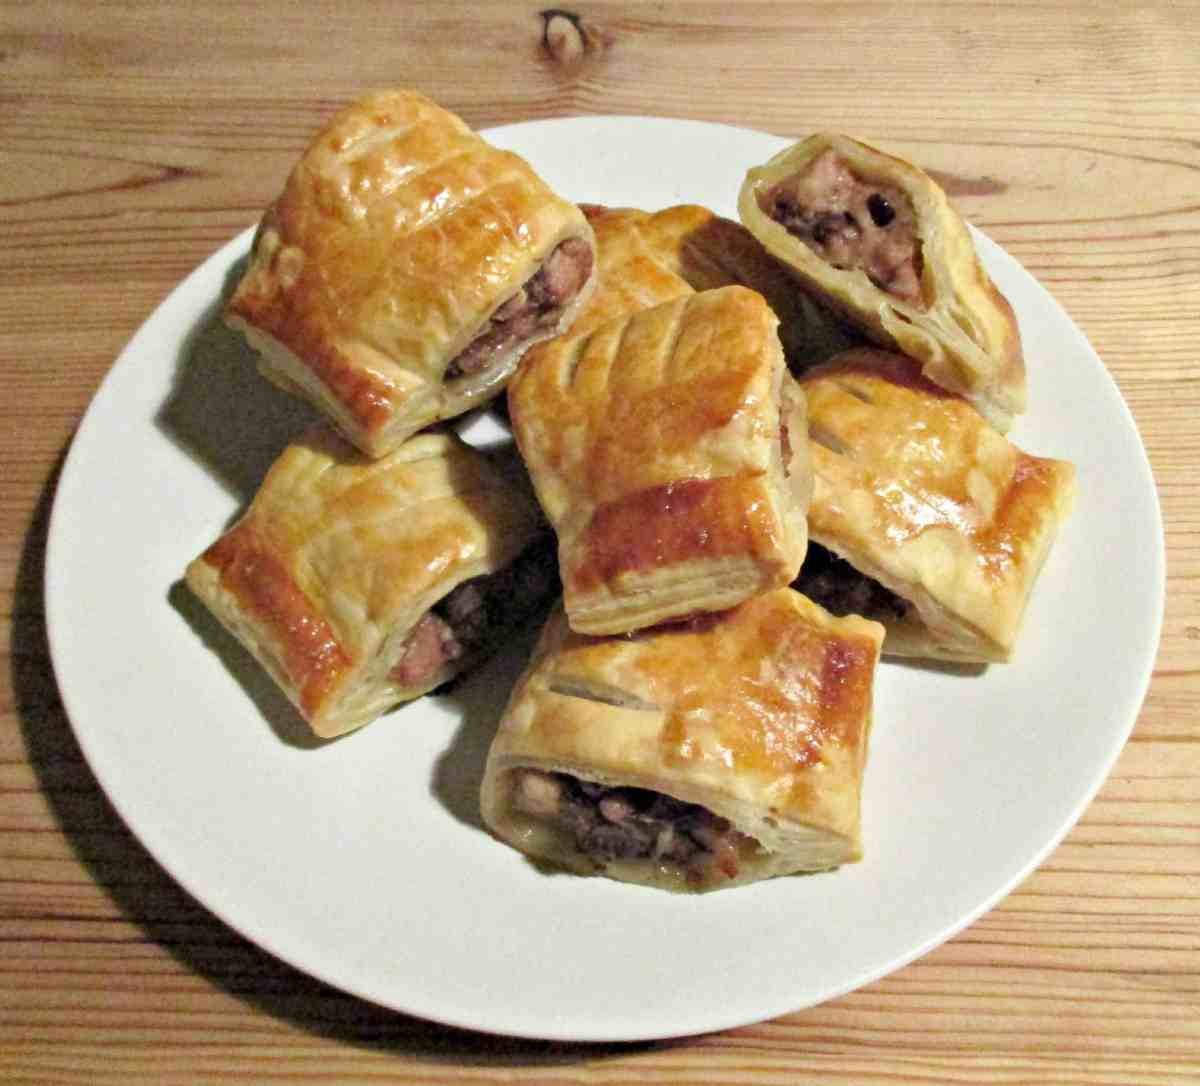 Craft invaders hunter s sausage rolls for Sausage roll recipe uk